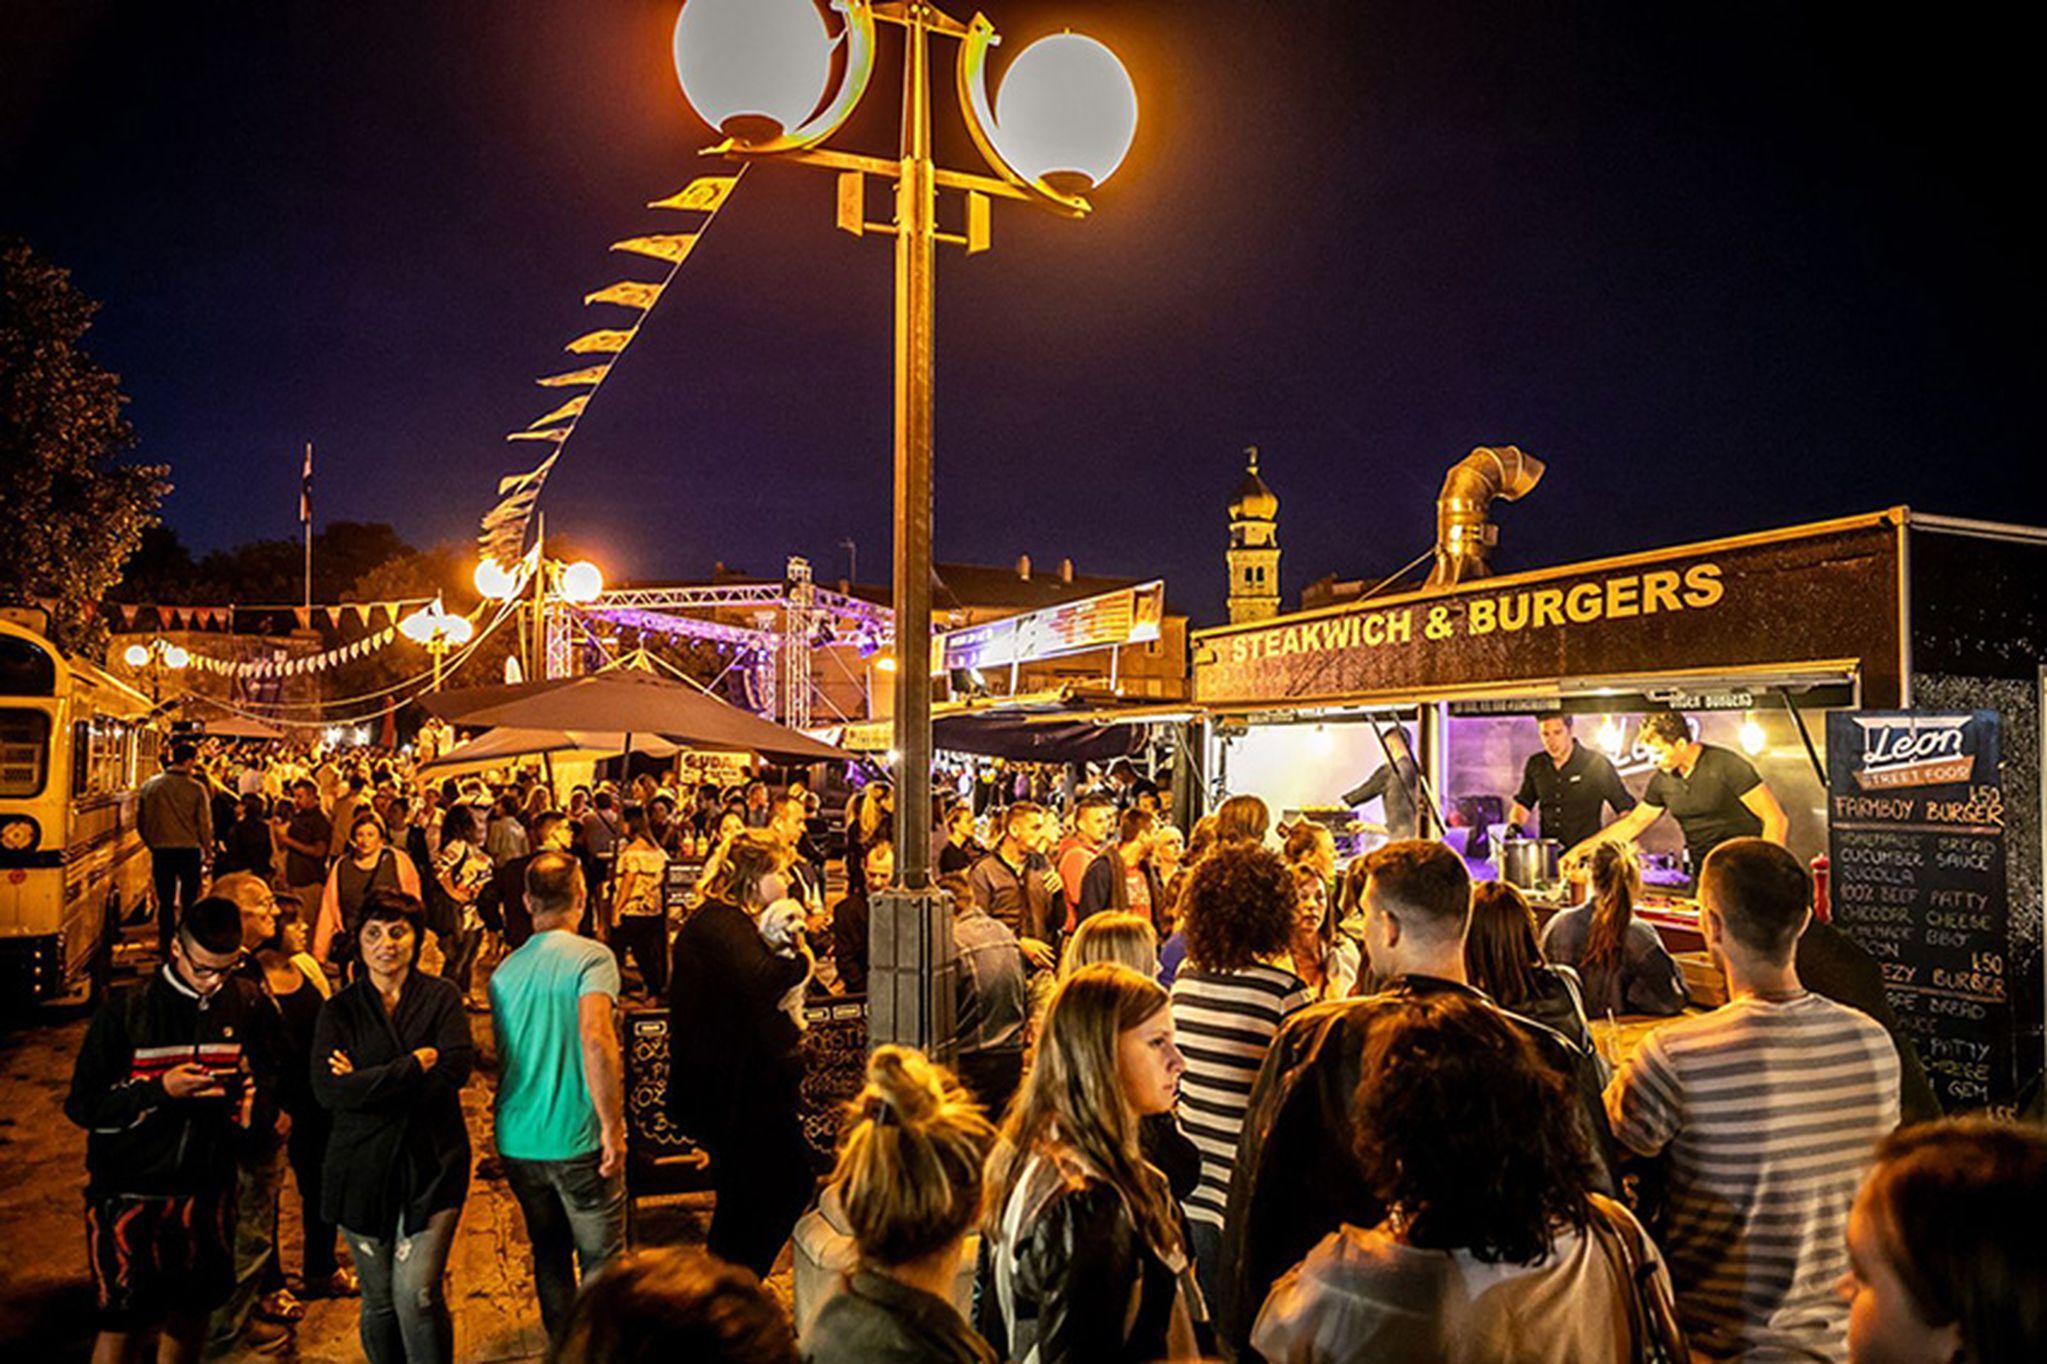 Puno dobre glazbe, plesa i hrane očekuje Krčane i njihove goste / Snimio Mladen TRINAJSTIĆ